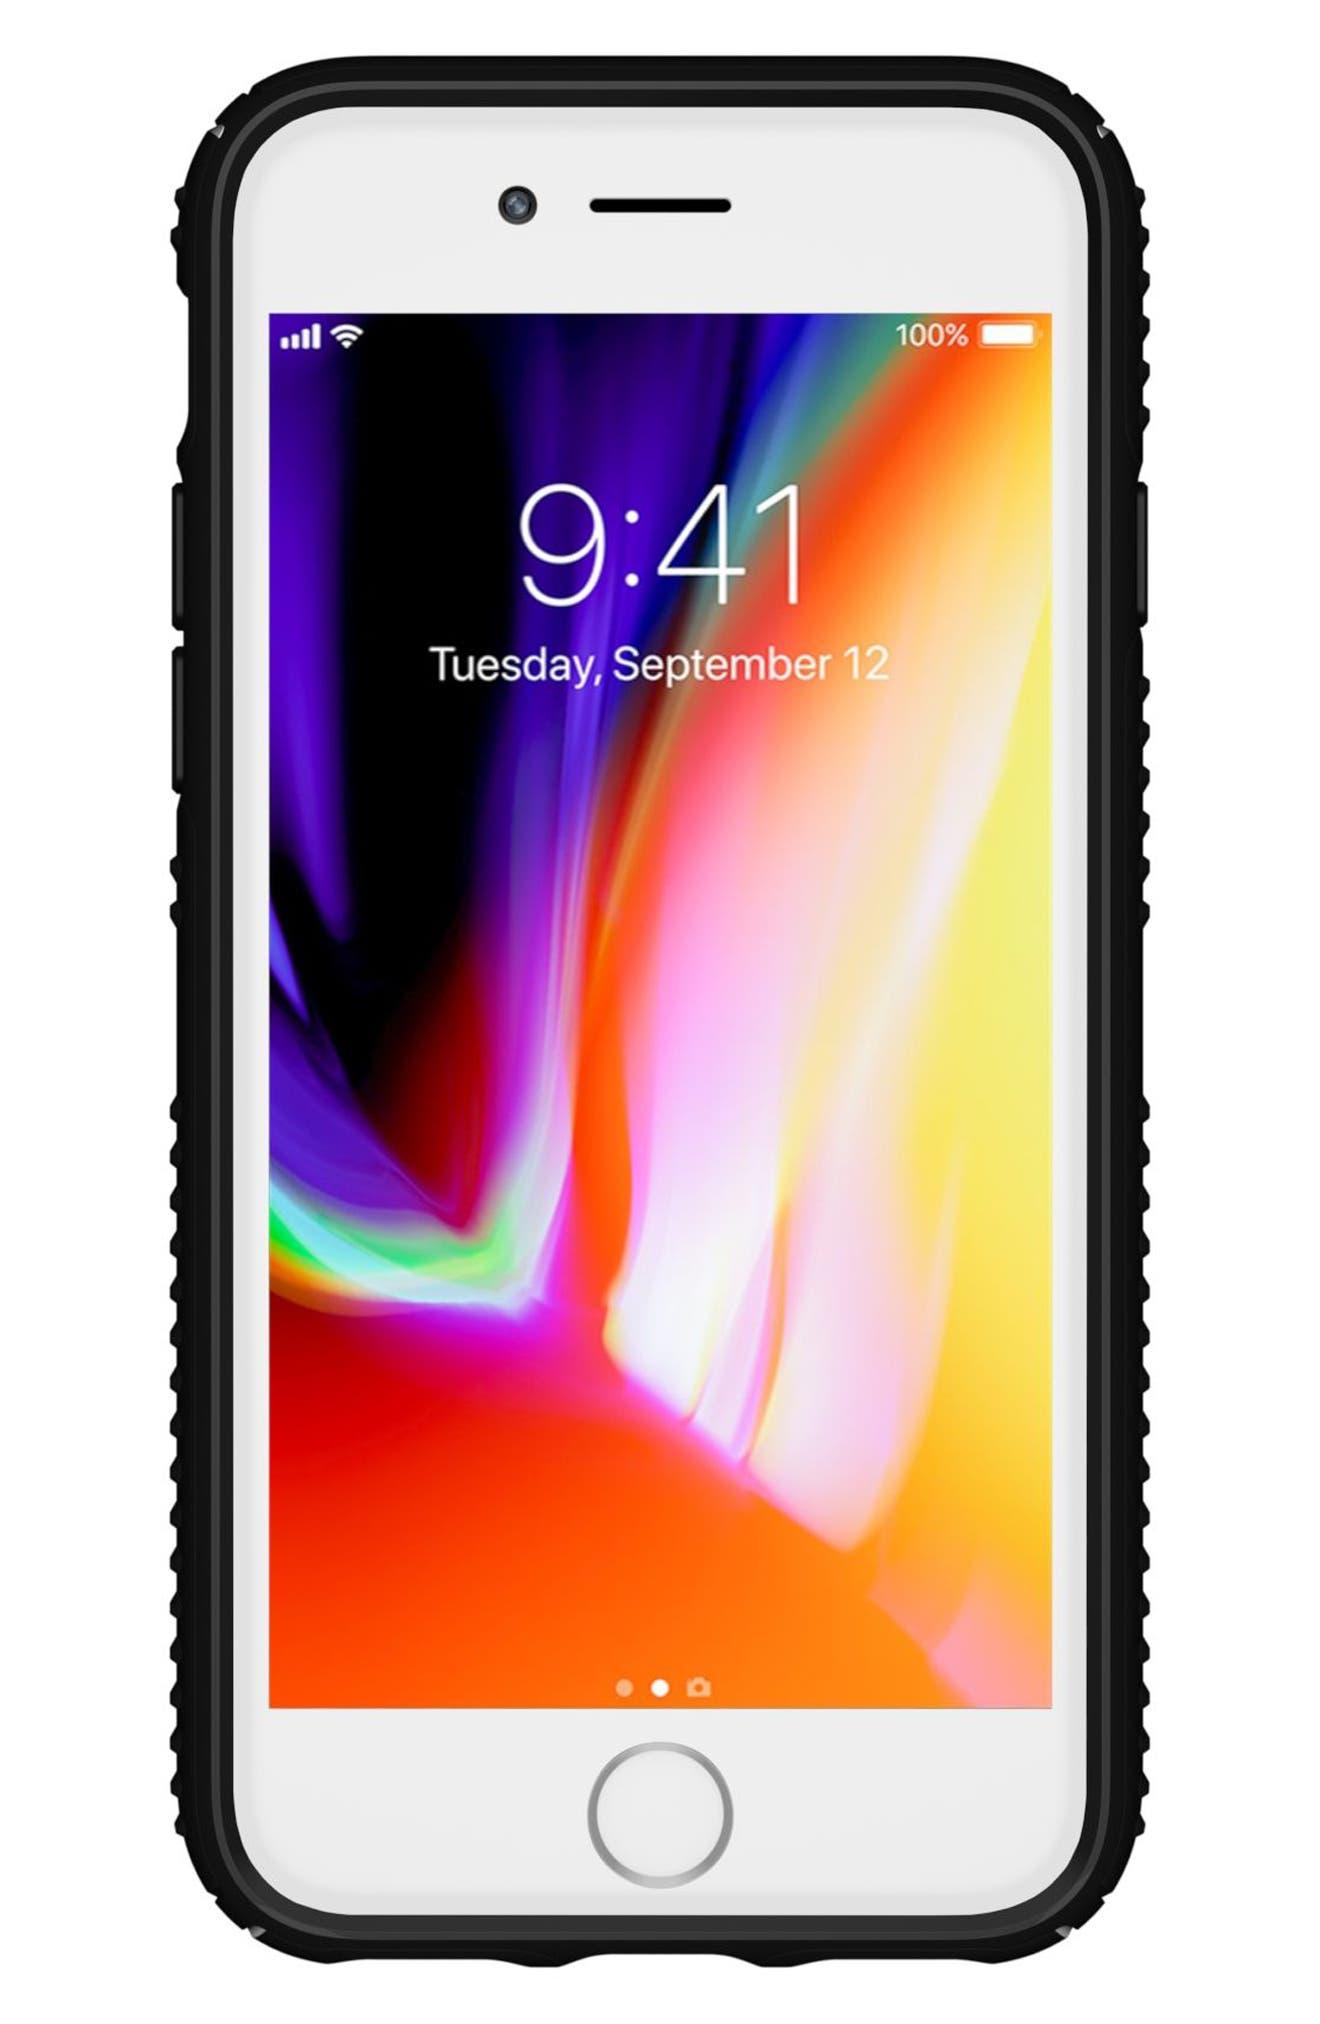 SPECK, Grip iPhone 6/6s/7/8 Case, Alternate thumbnail 3, color, 001